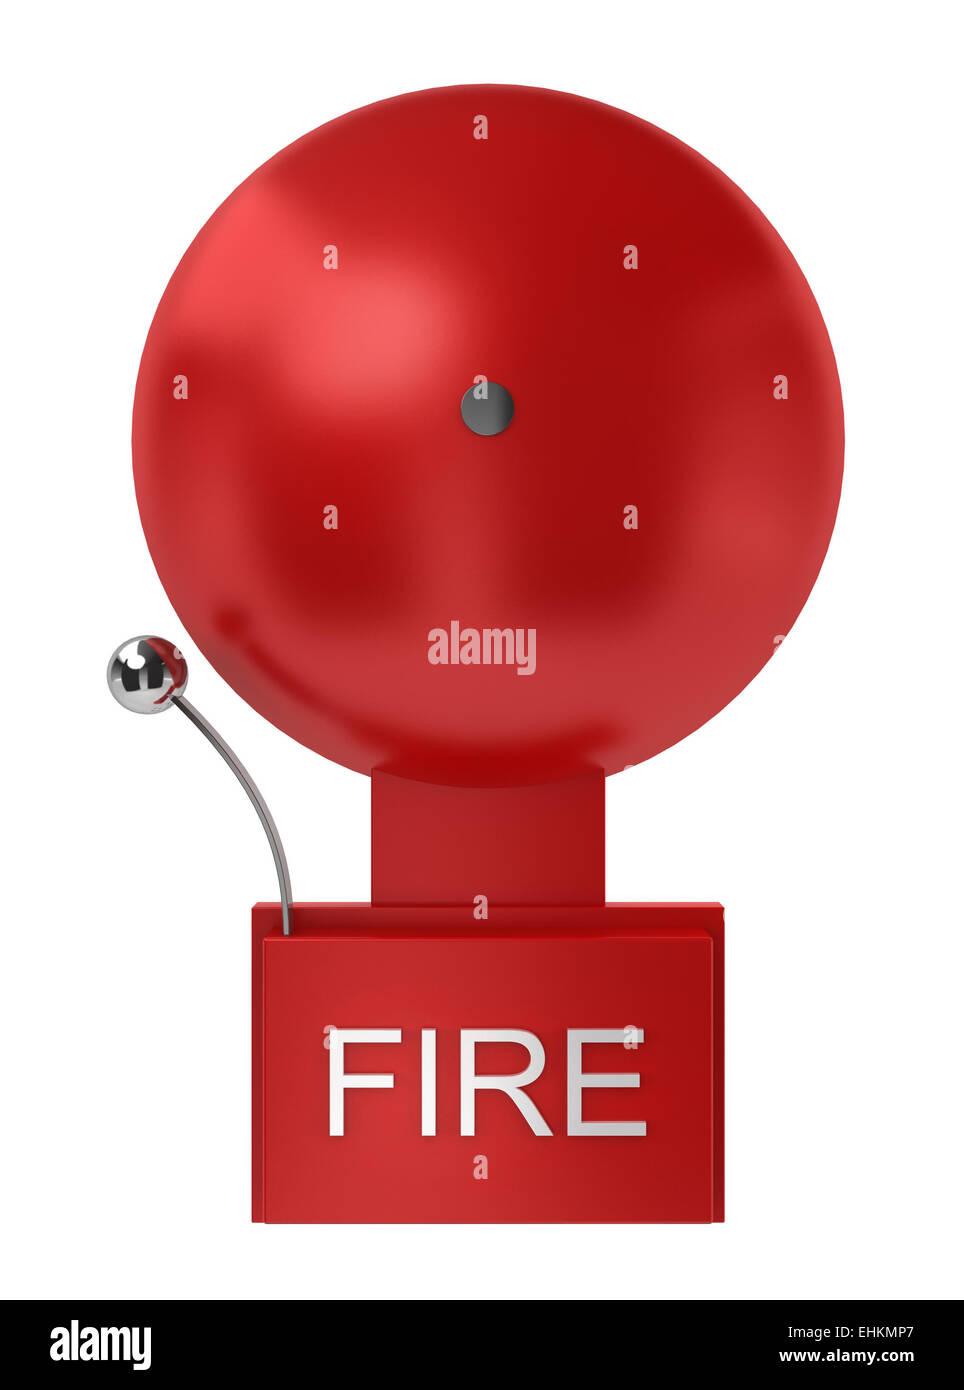 Fire alarm. 3d illustration on white background - Stock Image